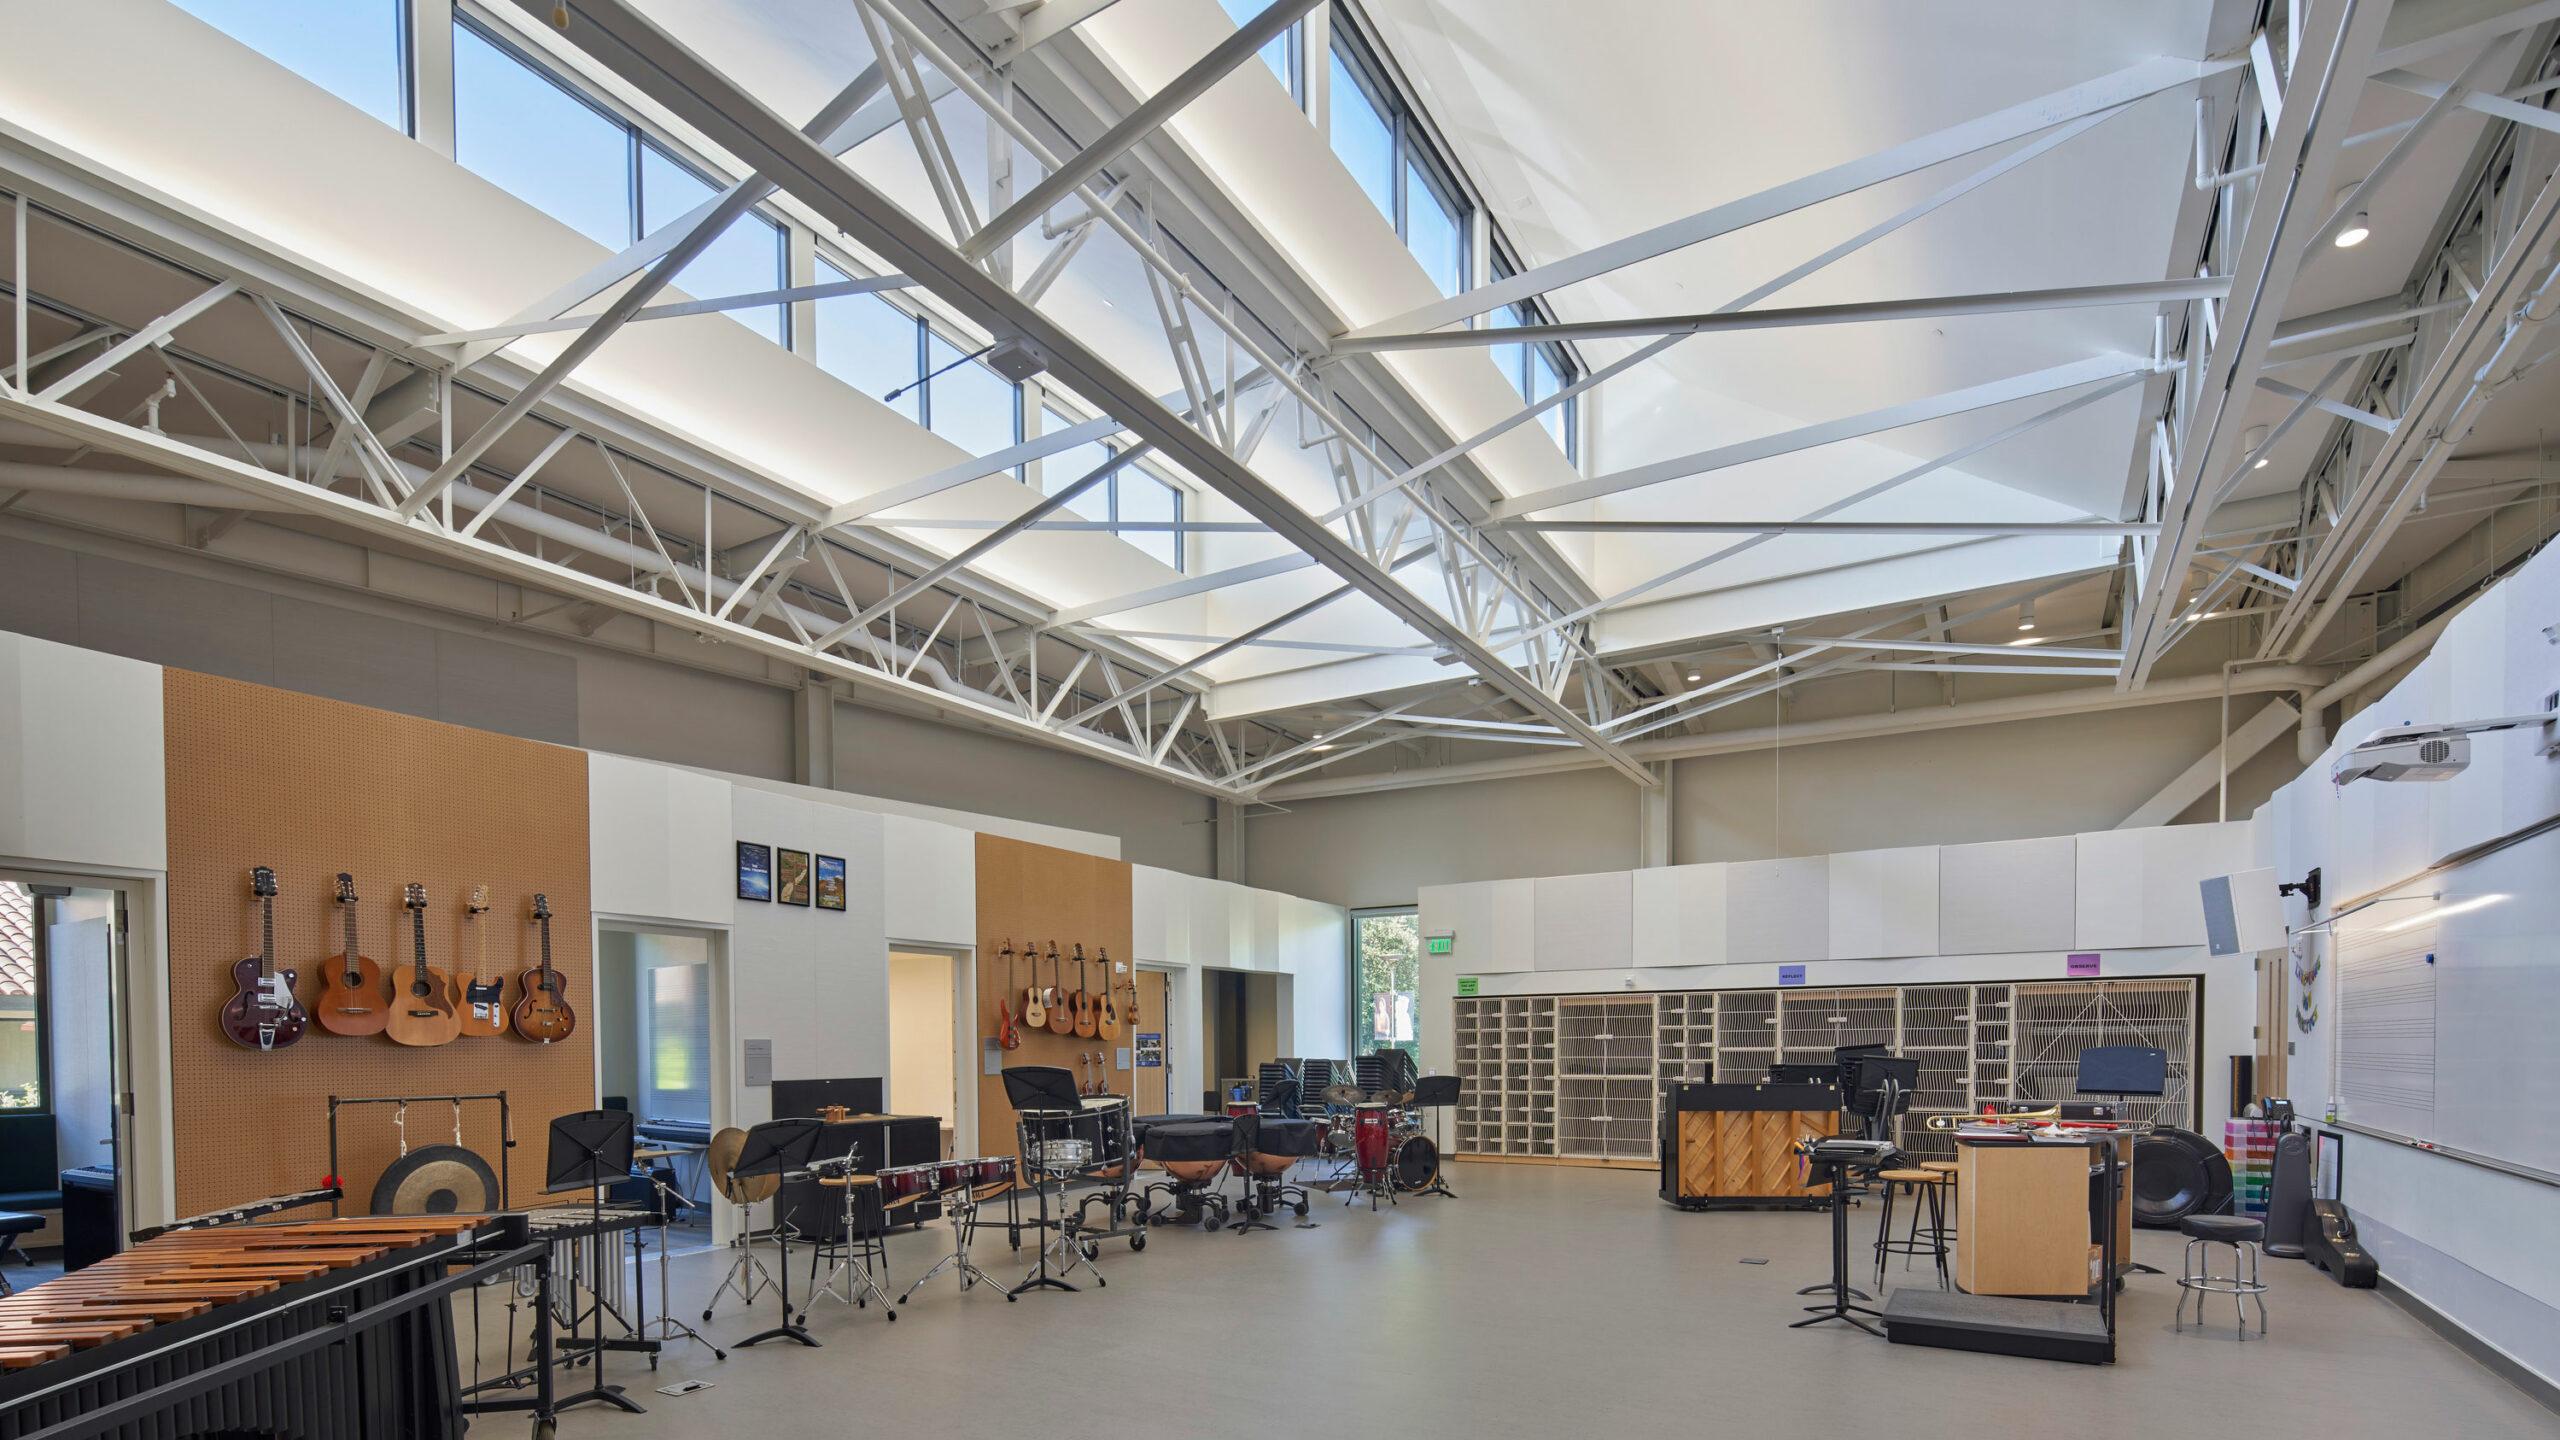 bandroom-daylighting-interiors